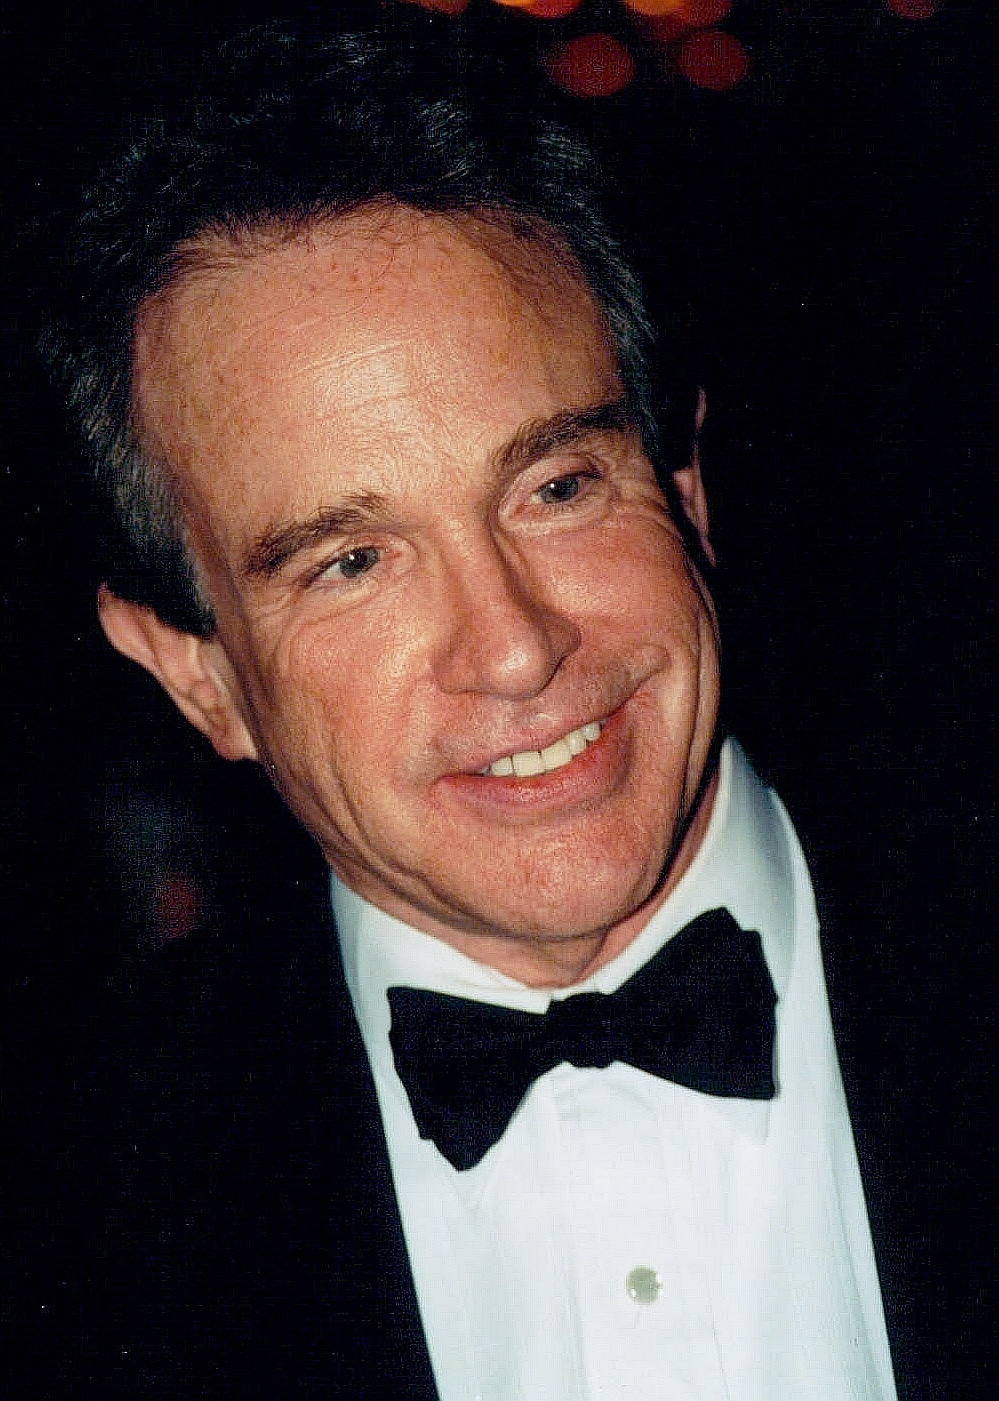 Warren Beatty American Actor, Filmmaker